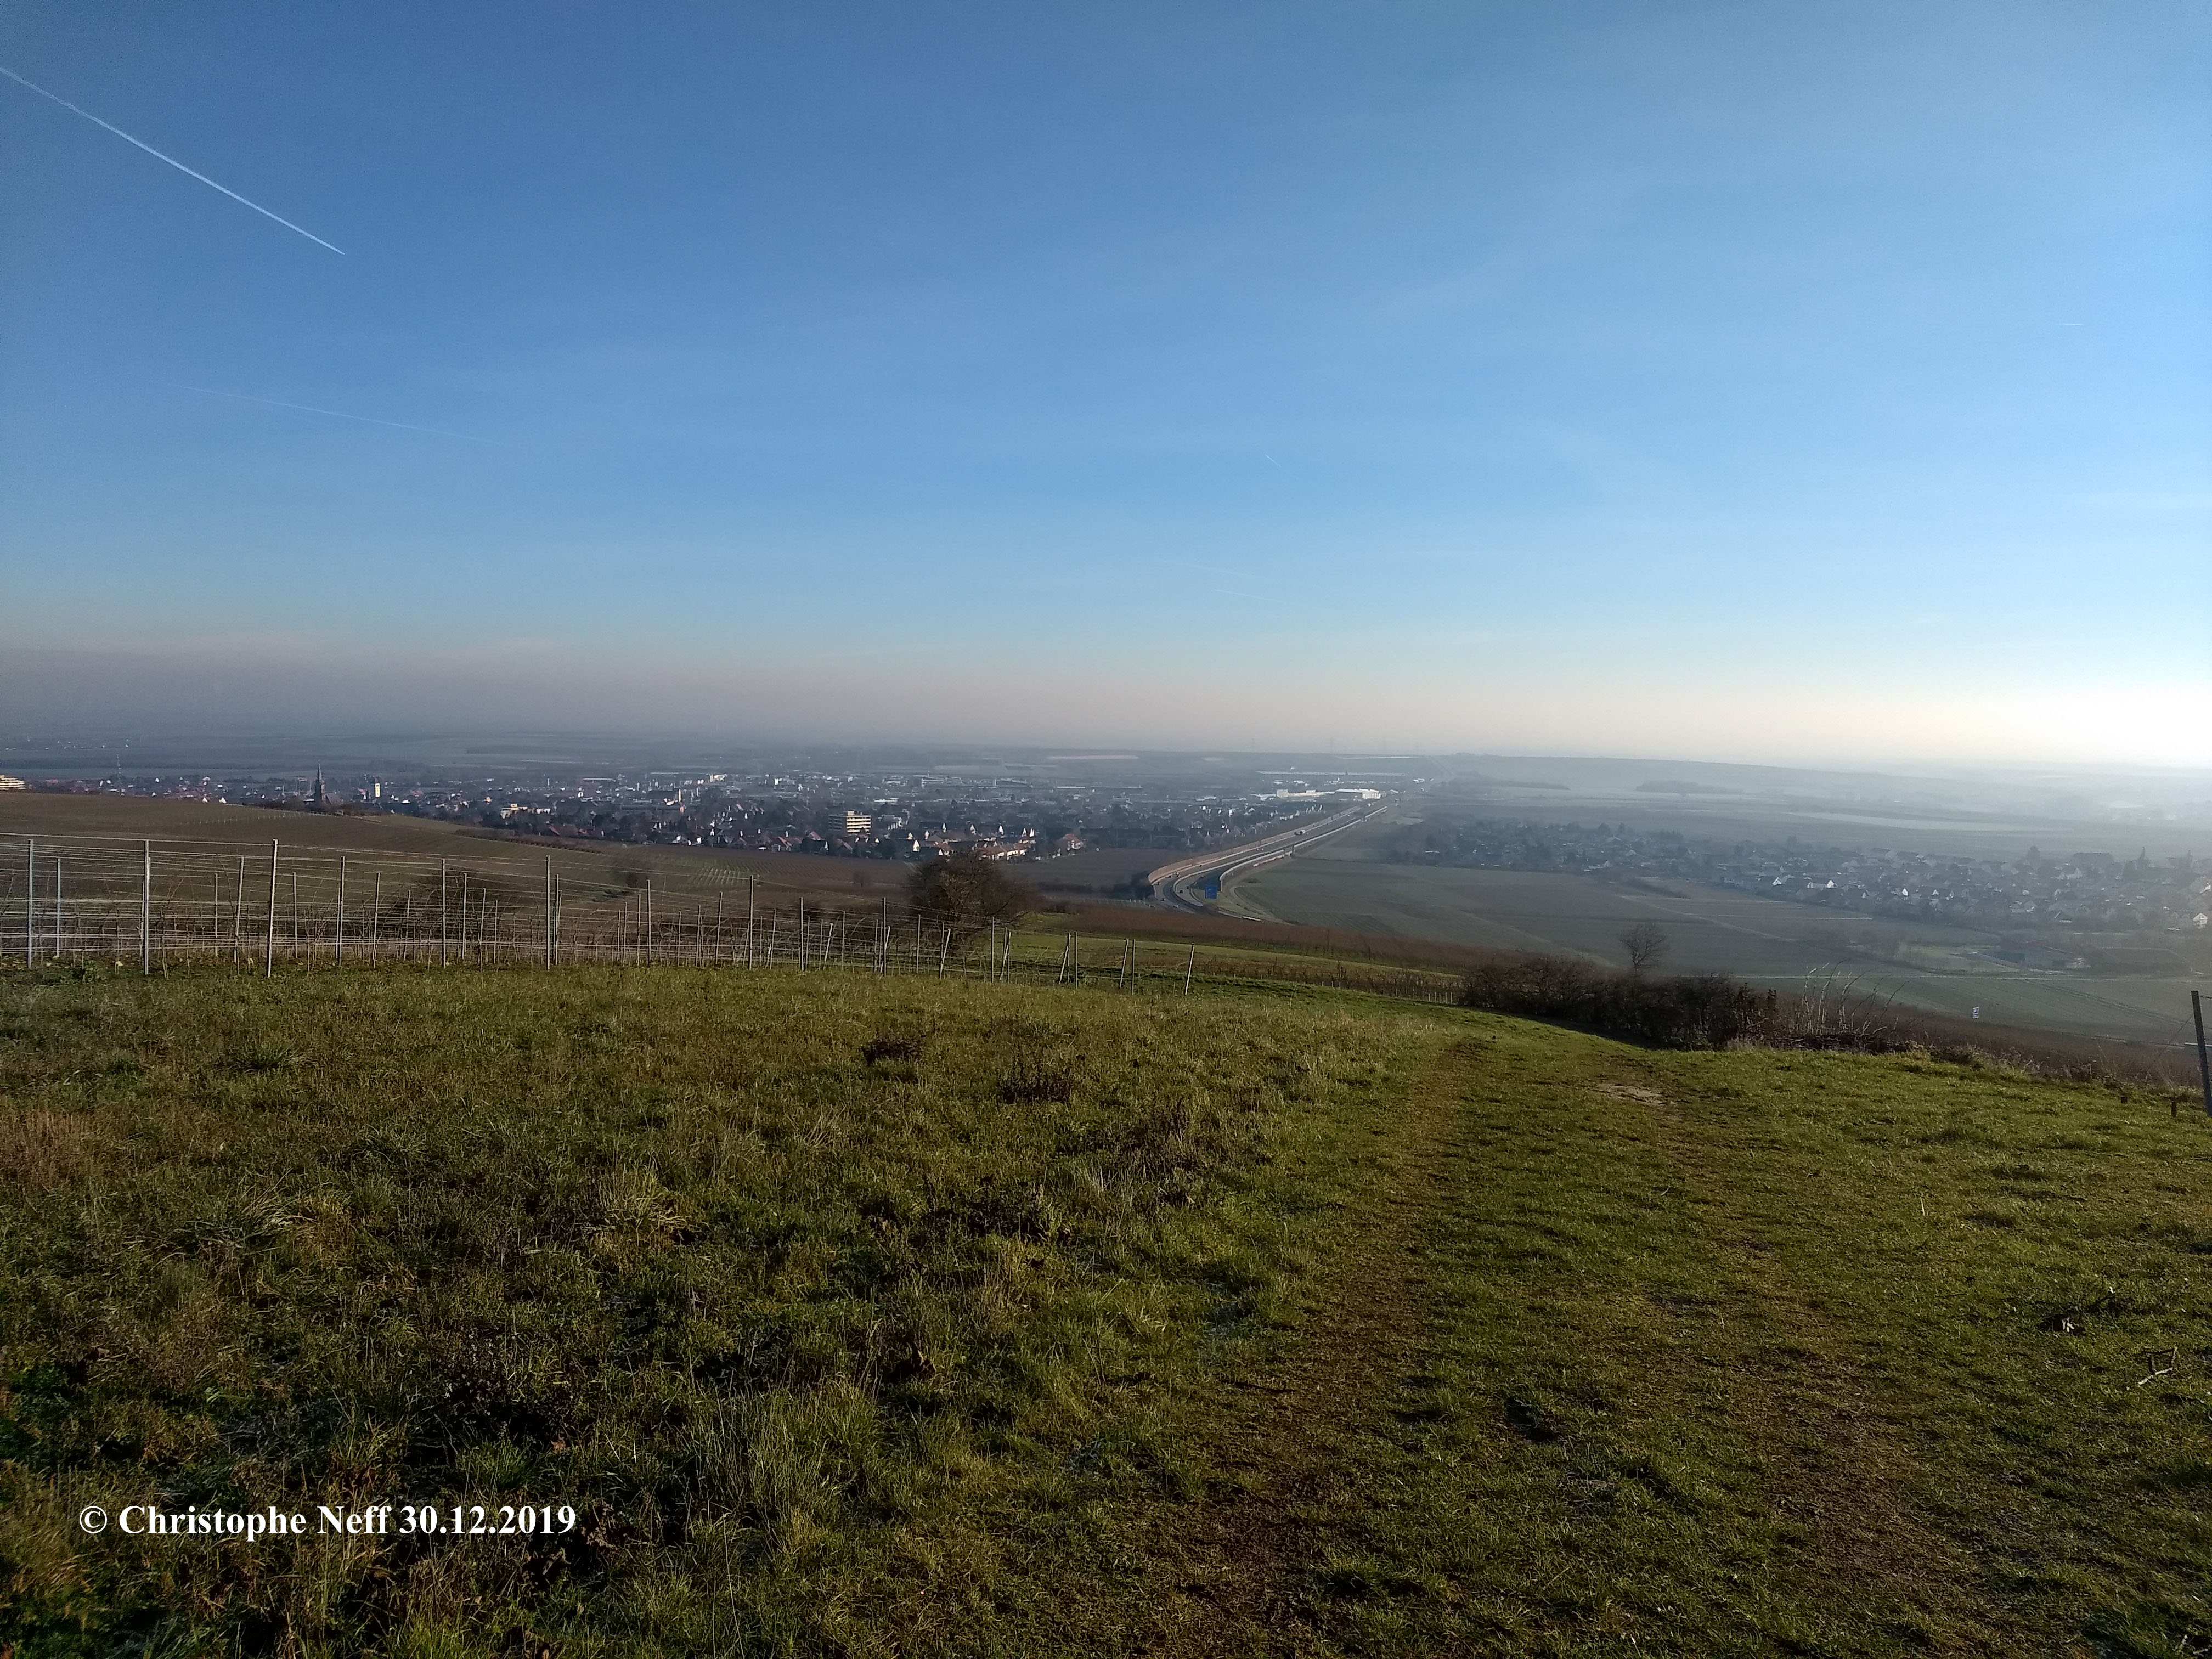 Vue depuis le Grünstadter Berg sur Grünstadt 30.12.2019